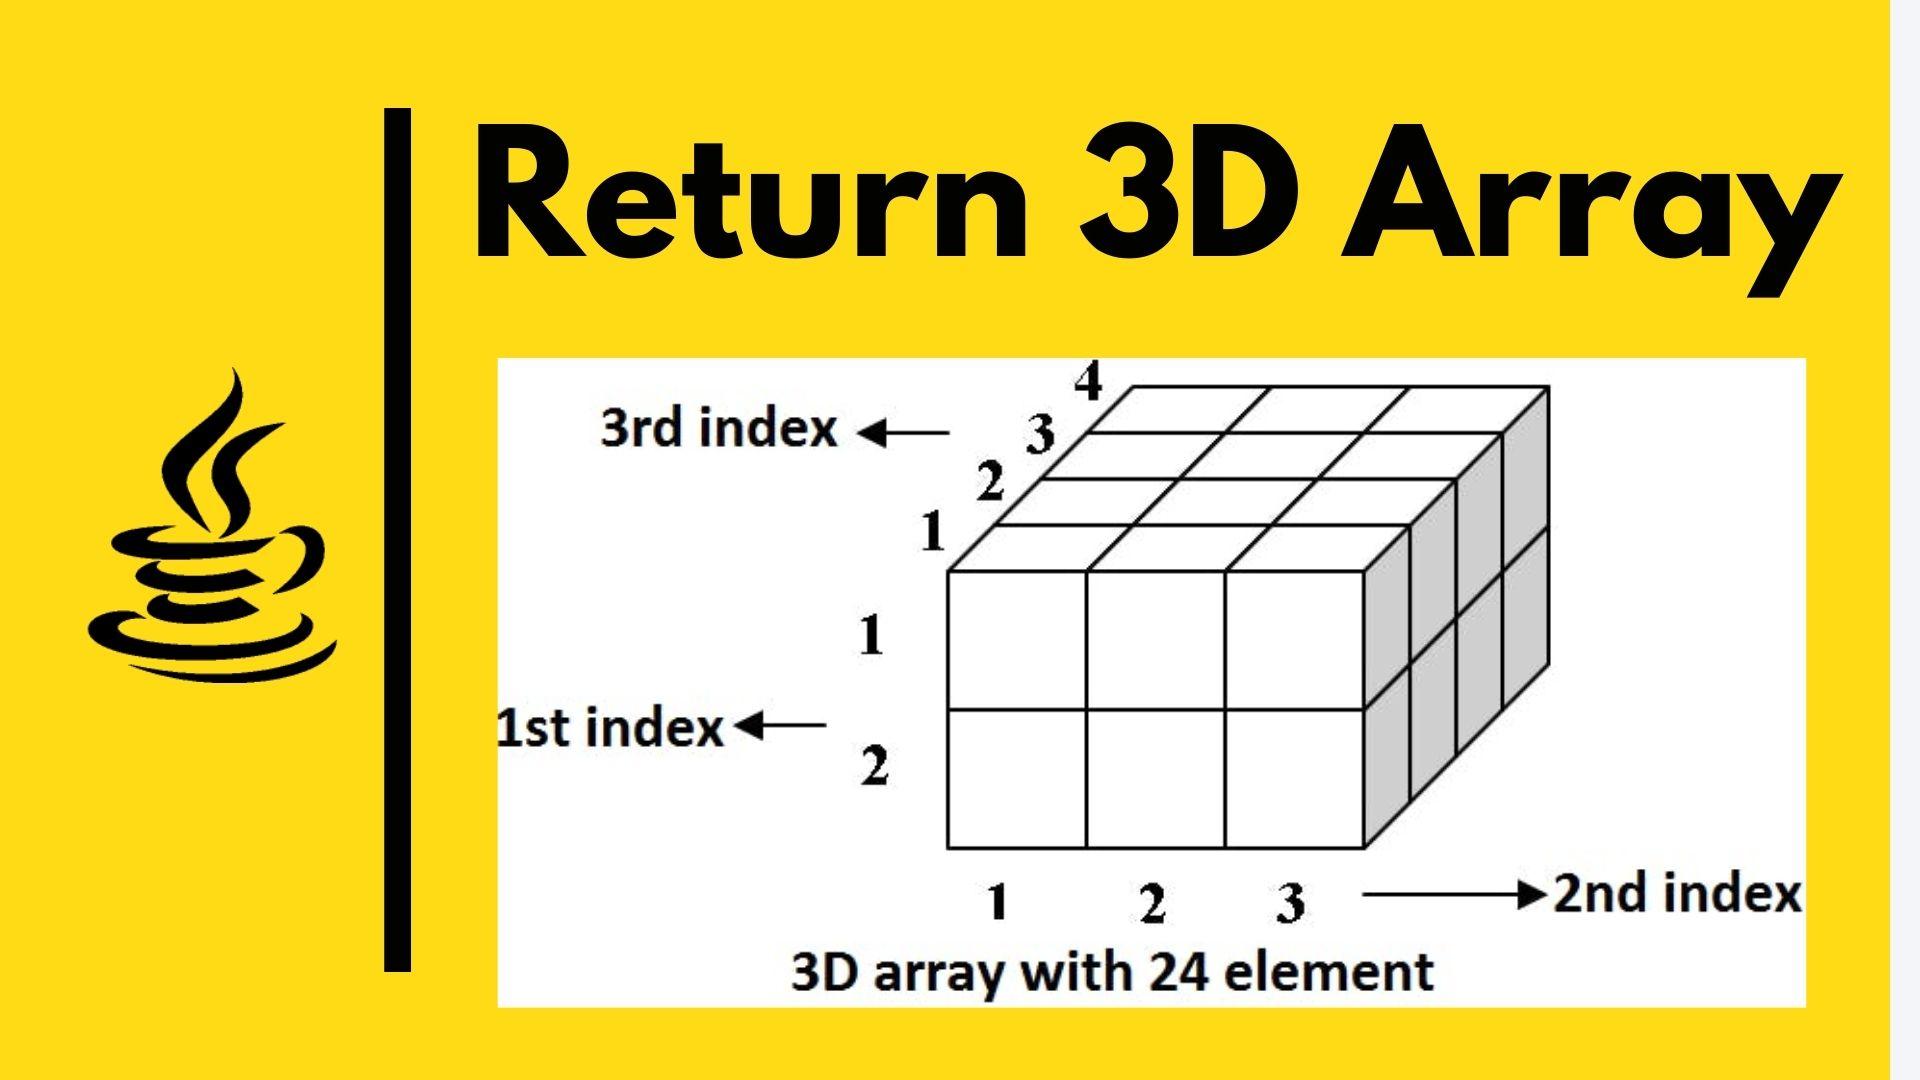 Return a 3D array from a method